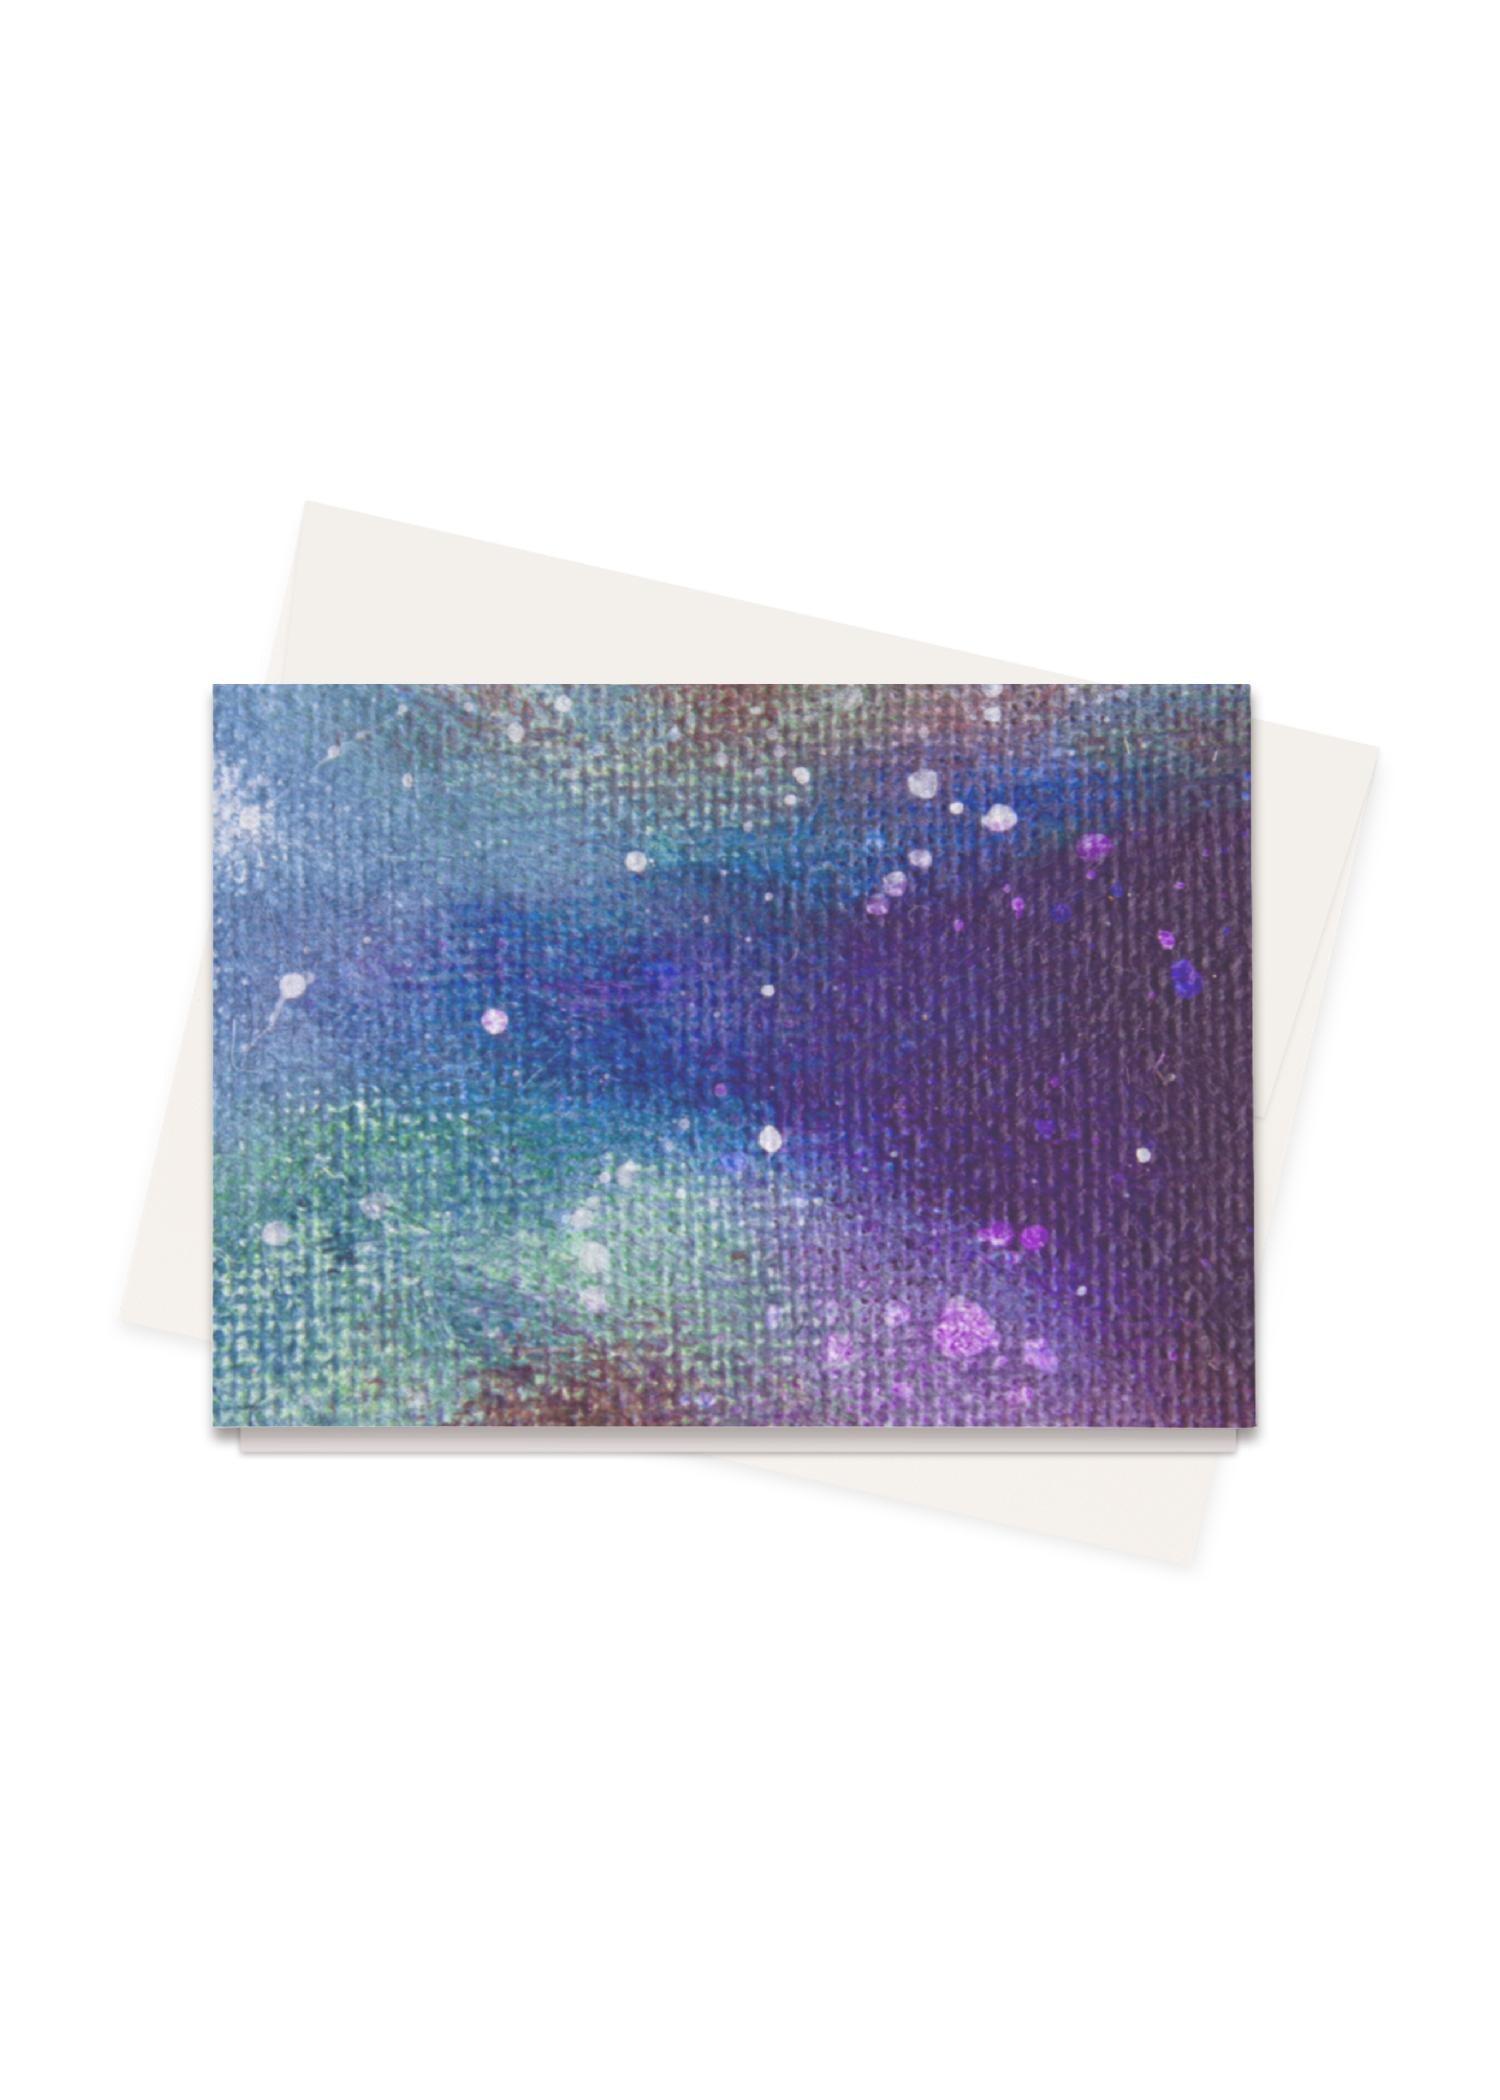 VIDA Greeting Cards Set - Cosmo Pillow in Blue/Purple by VIDA Original Artist  - Size: Set of 8